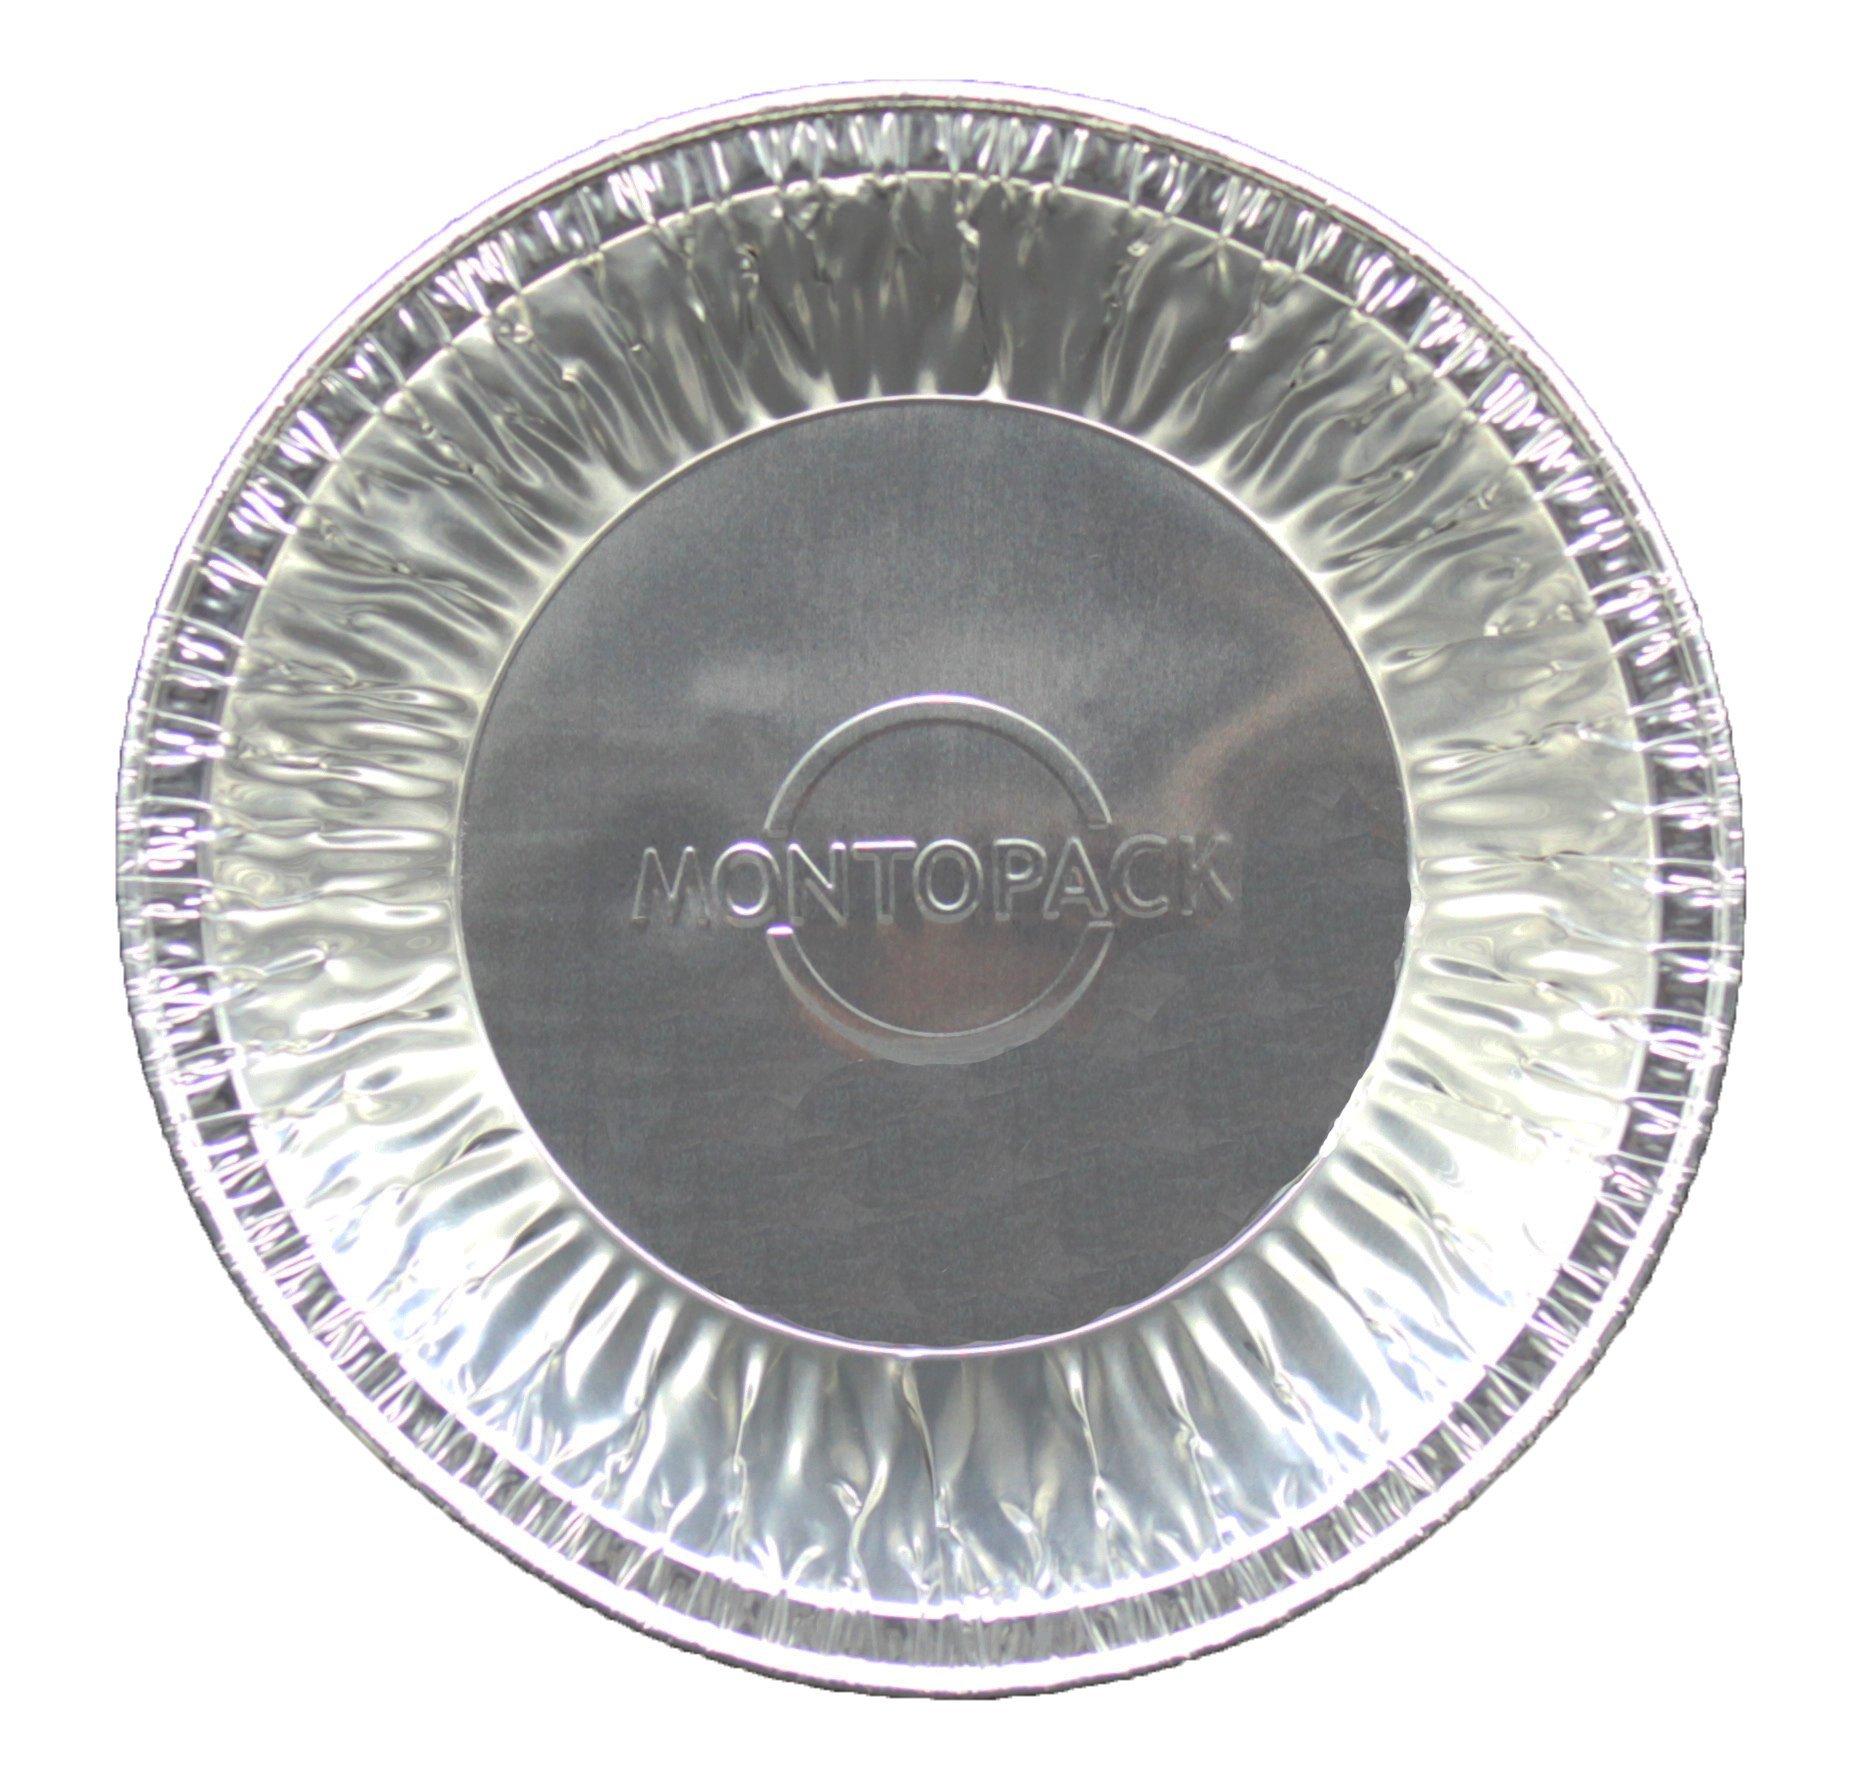 MontoPack Disposable 5'' Aluminum Foil Tart/Pie Pans (50 Pack) by MontoPack (Image #2)